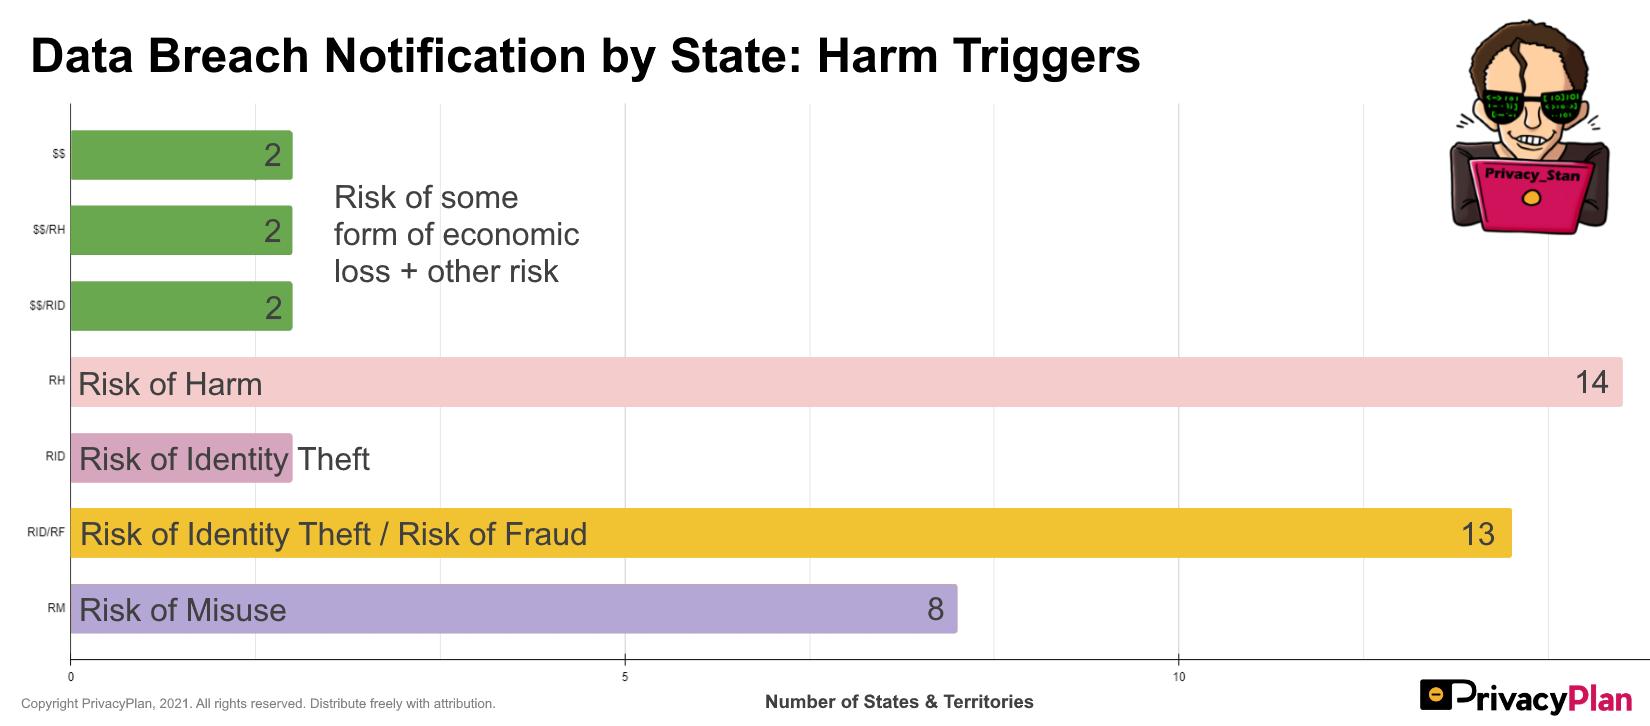 Data Breach Notification Triggers: Harm